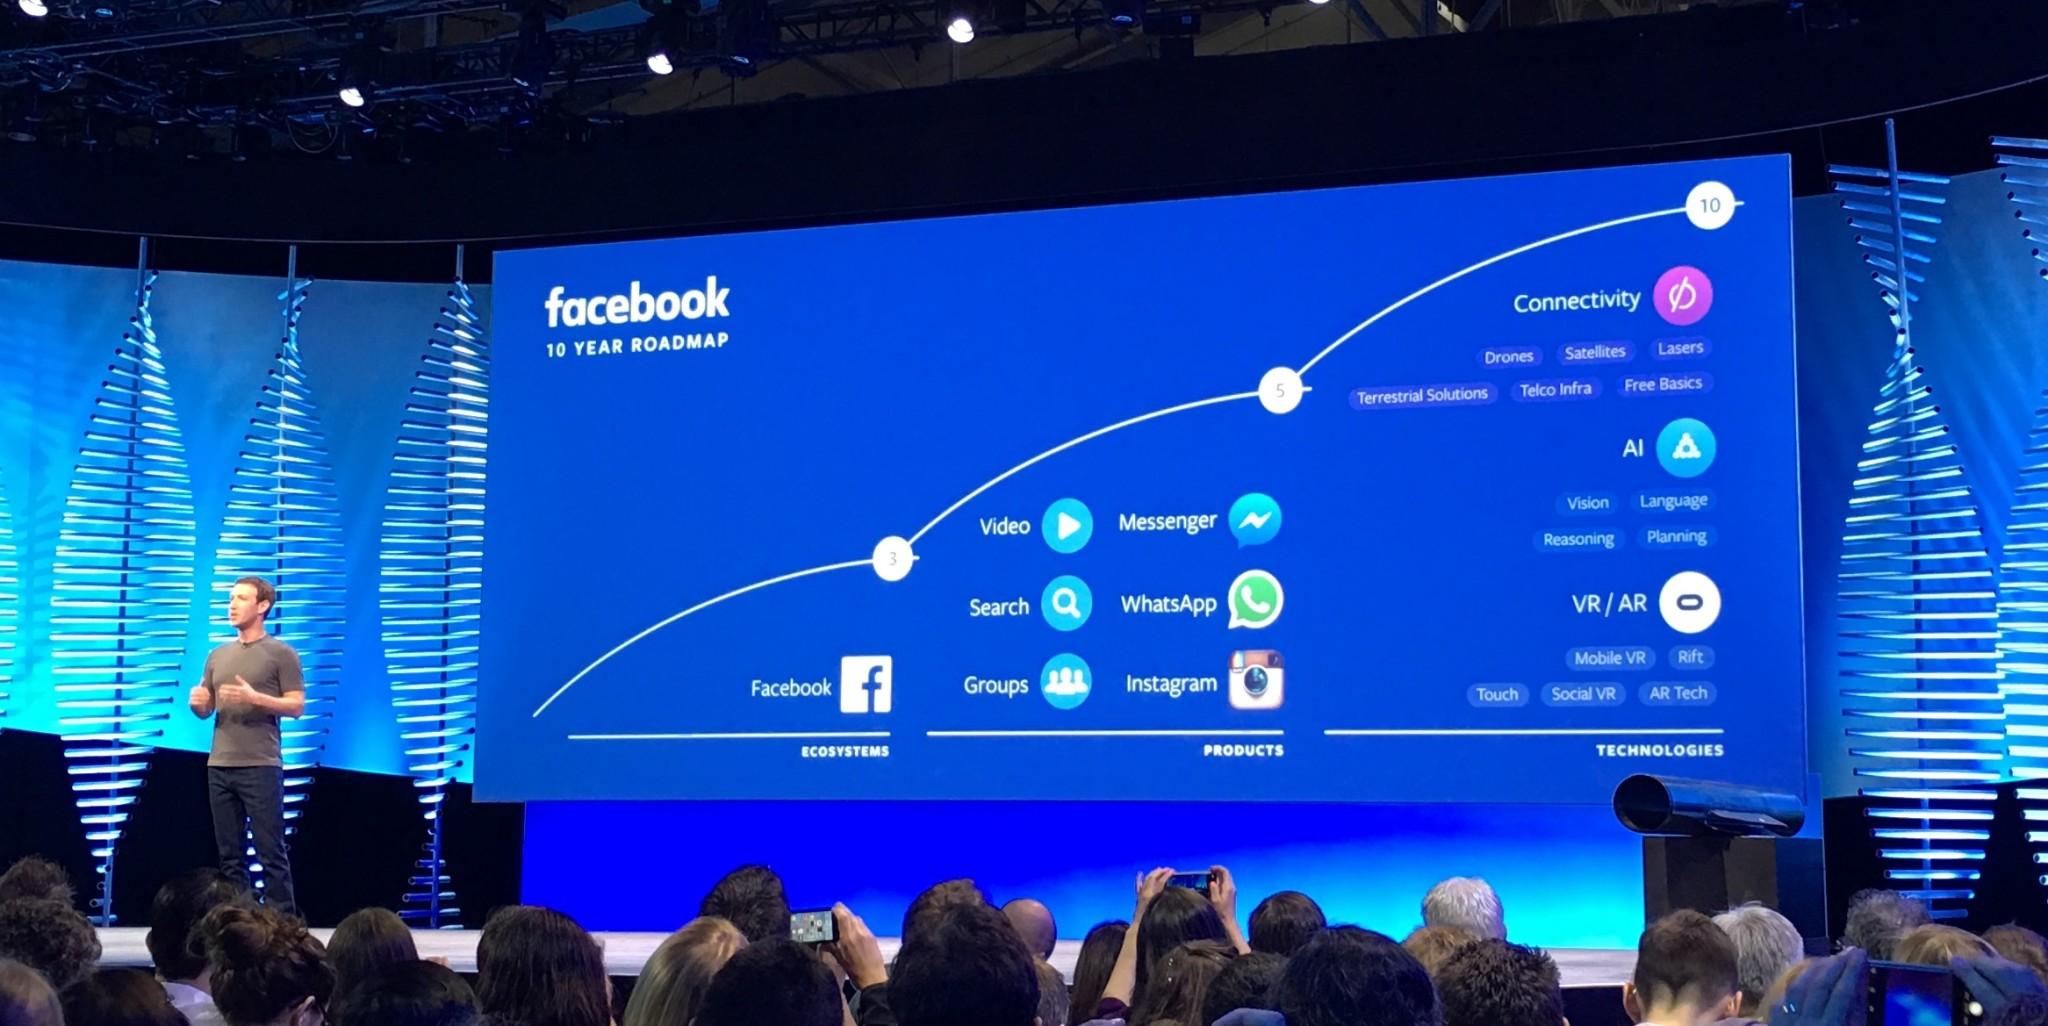 Futuro de Facebook